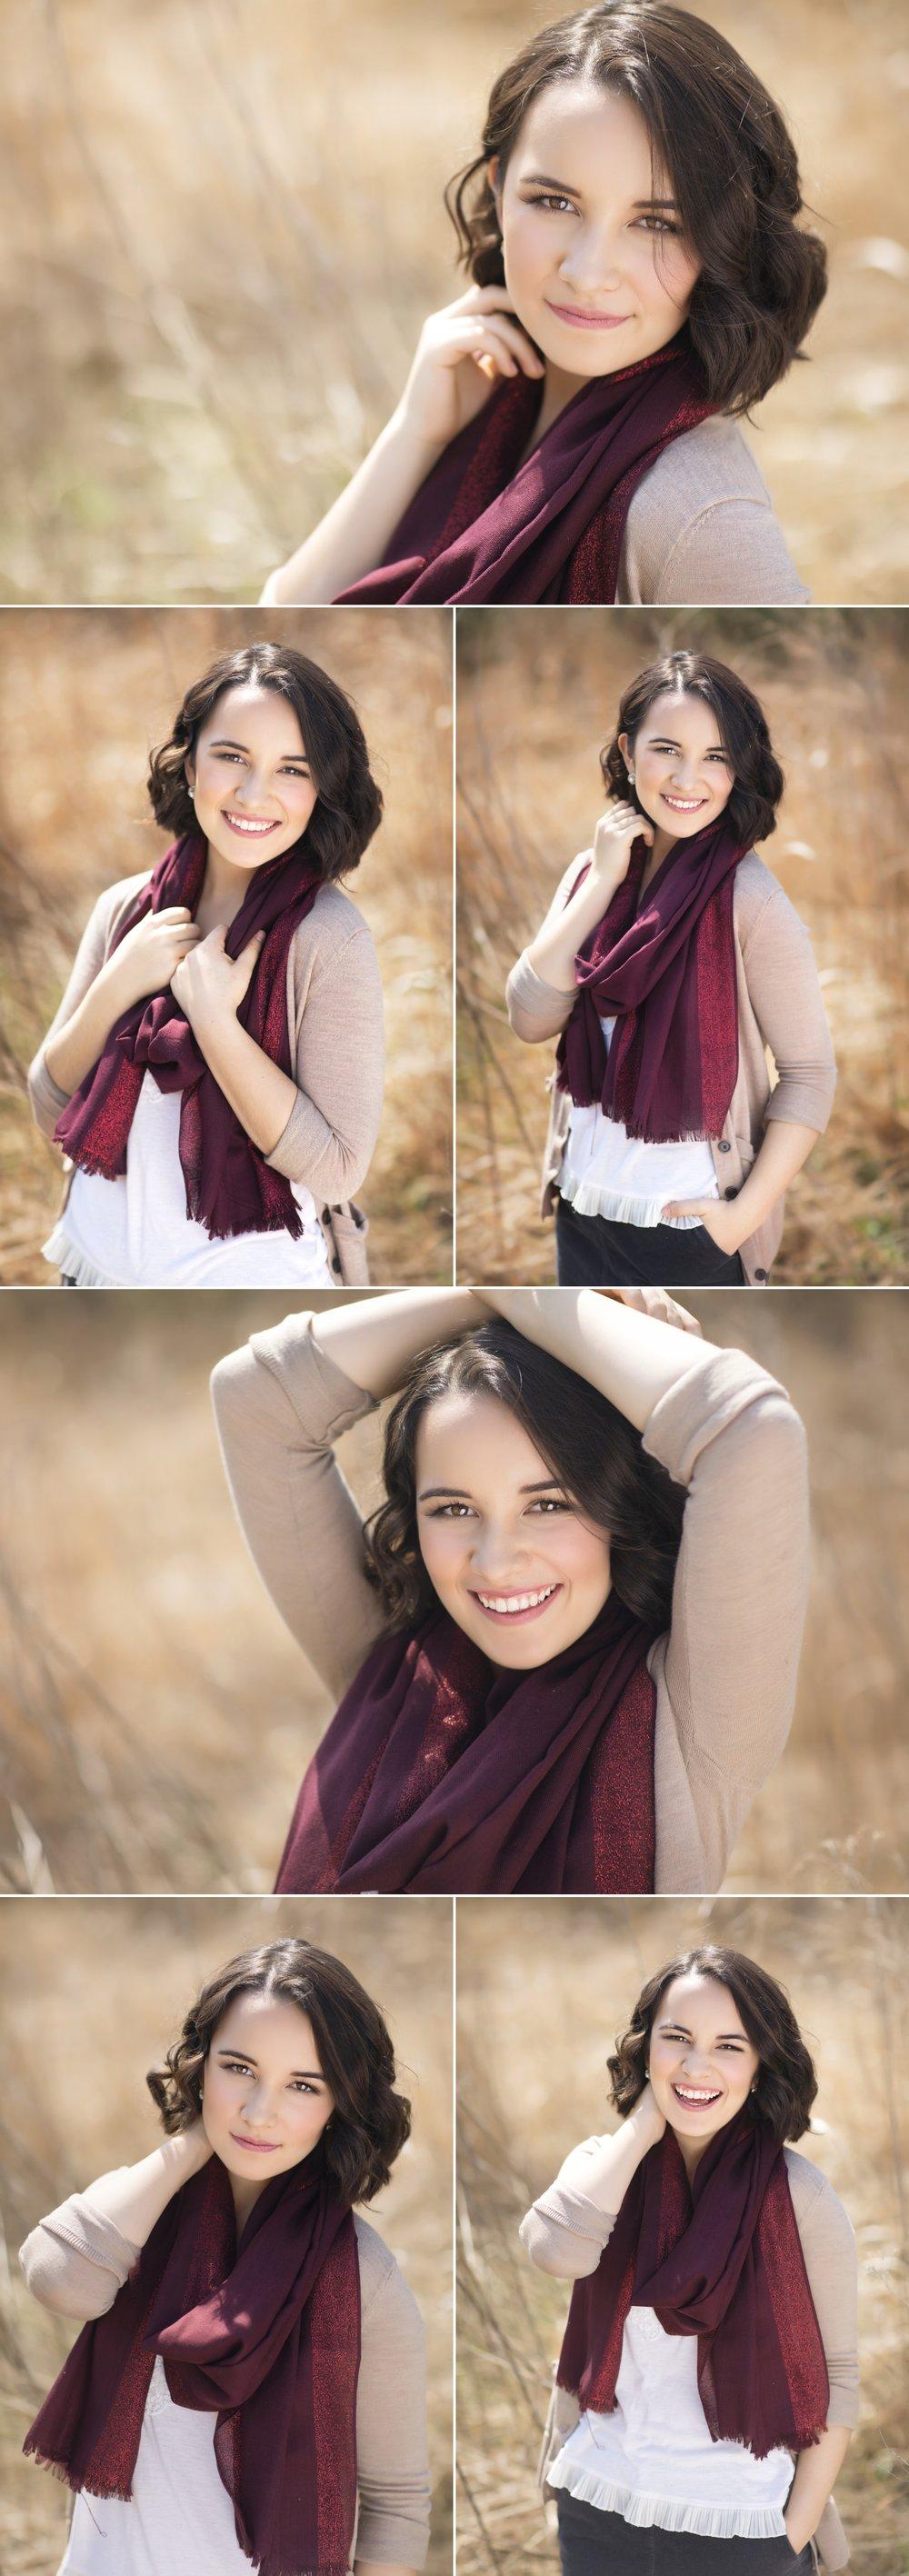 Elizabeth Lindqwister 2.jpg